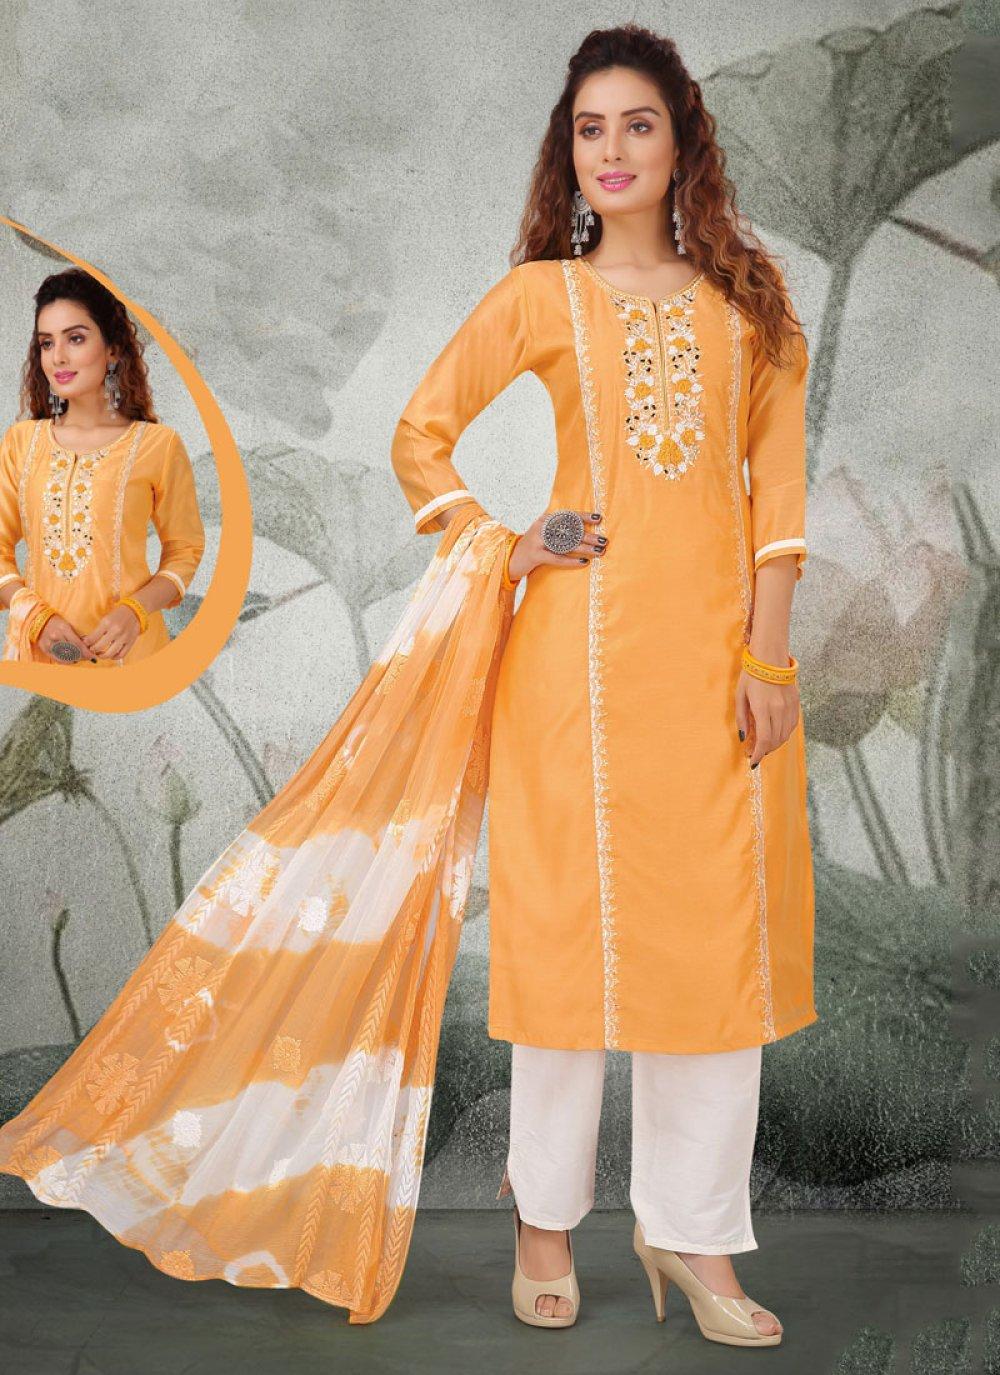 Embroidered Chanderi Salwar Kameez in Yellow